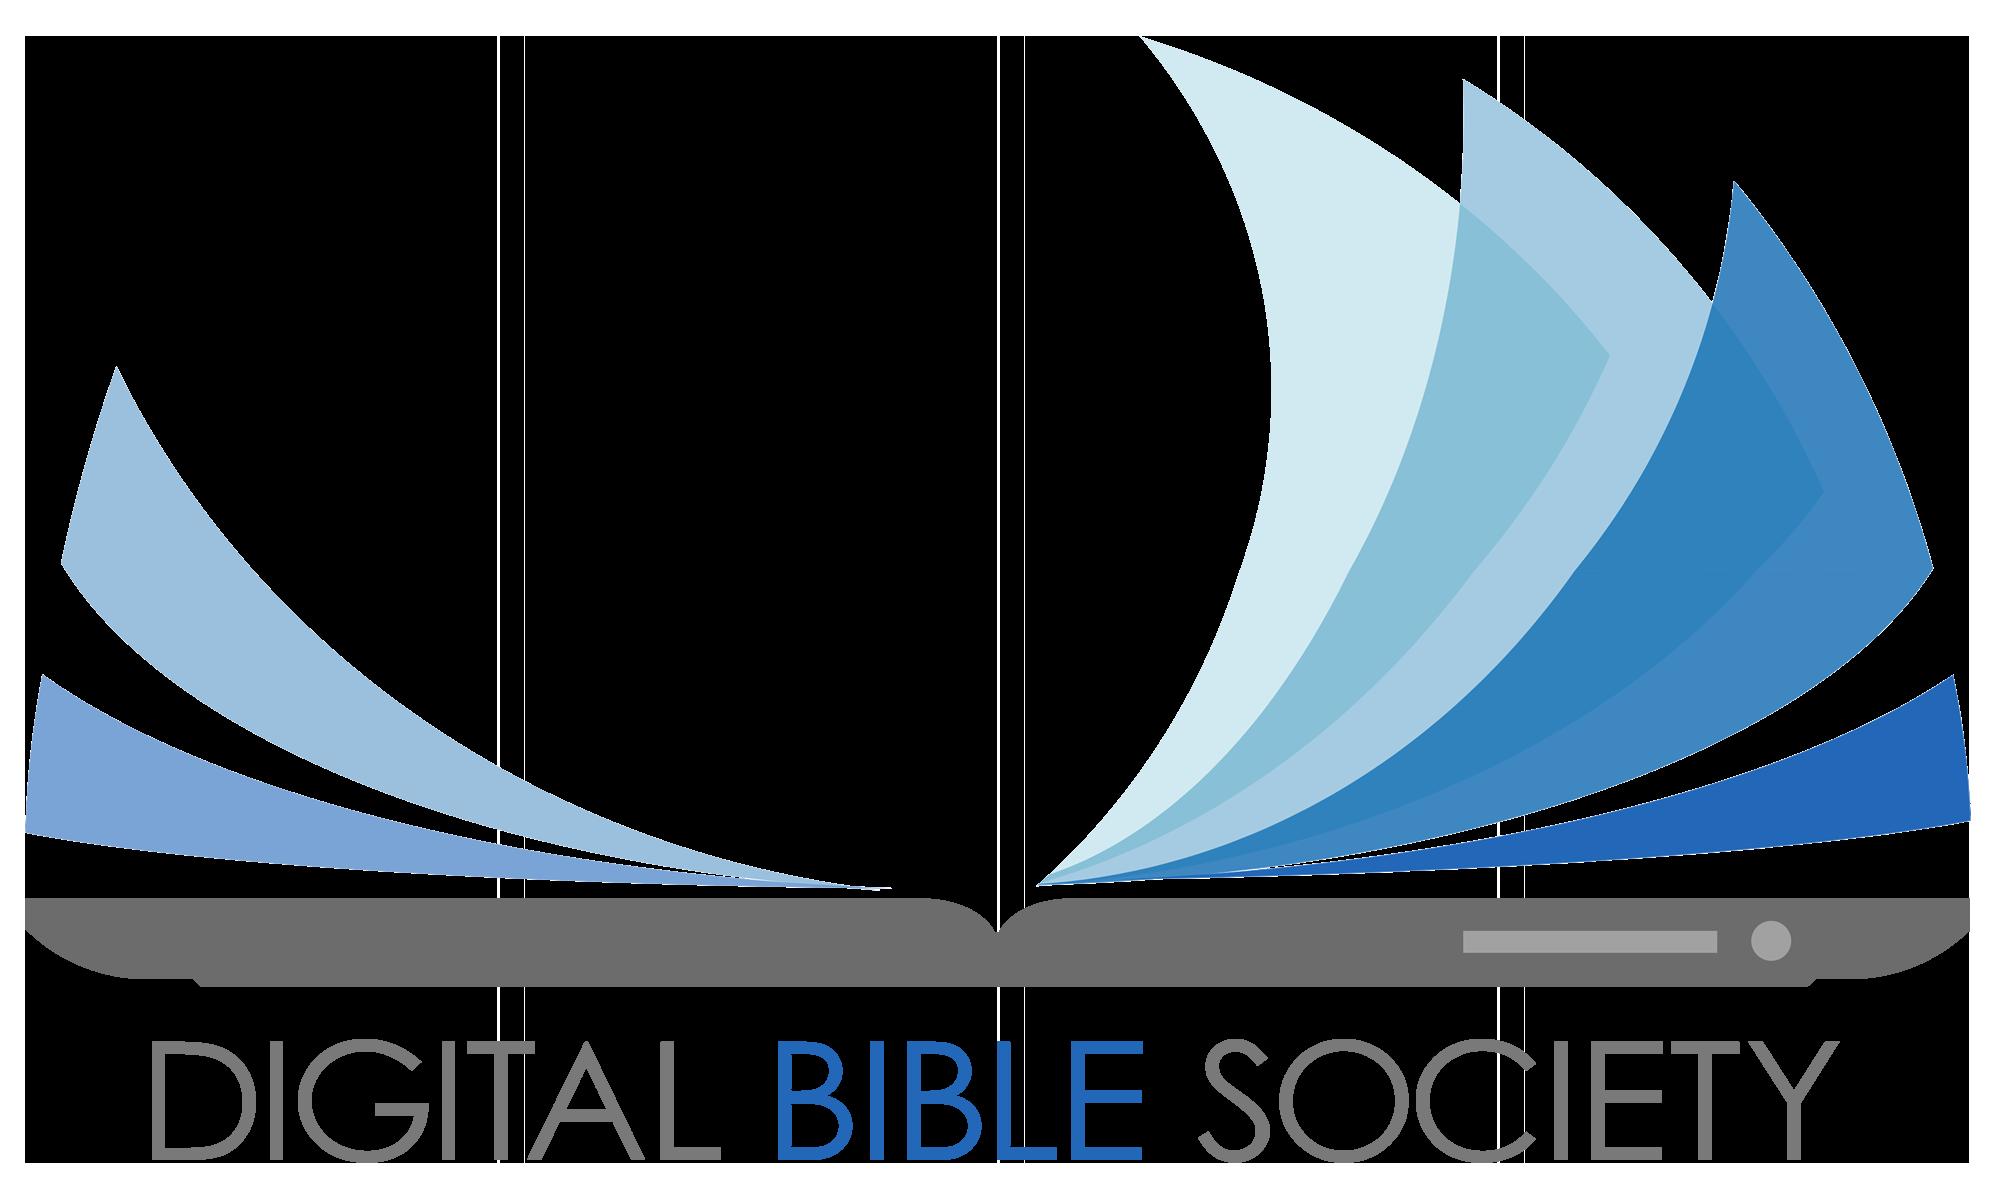 Dbs Logo PNG - 97312